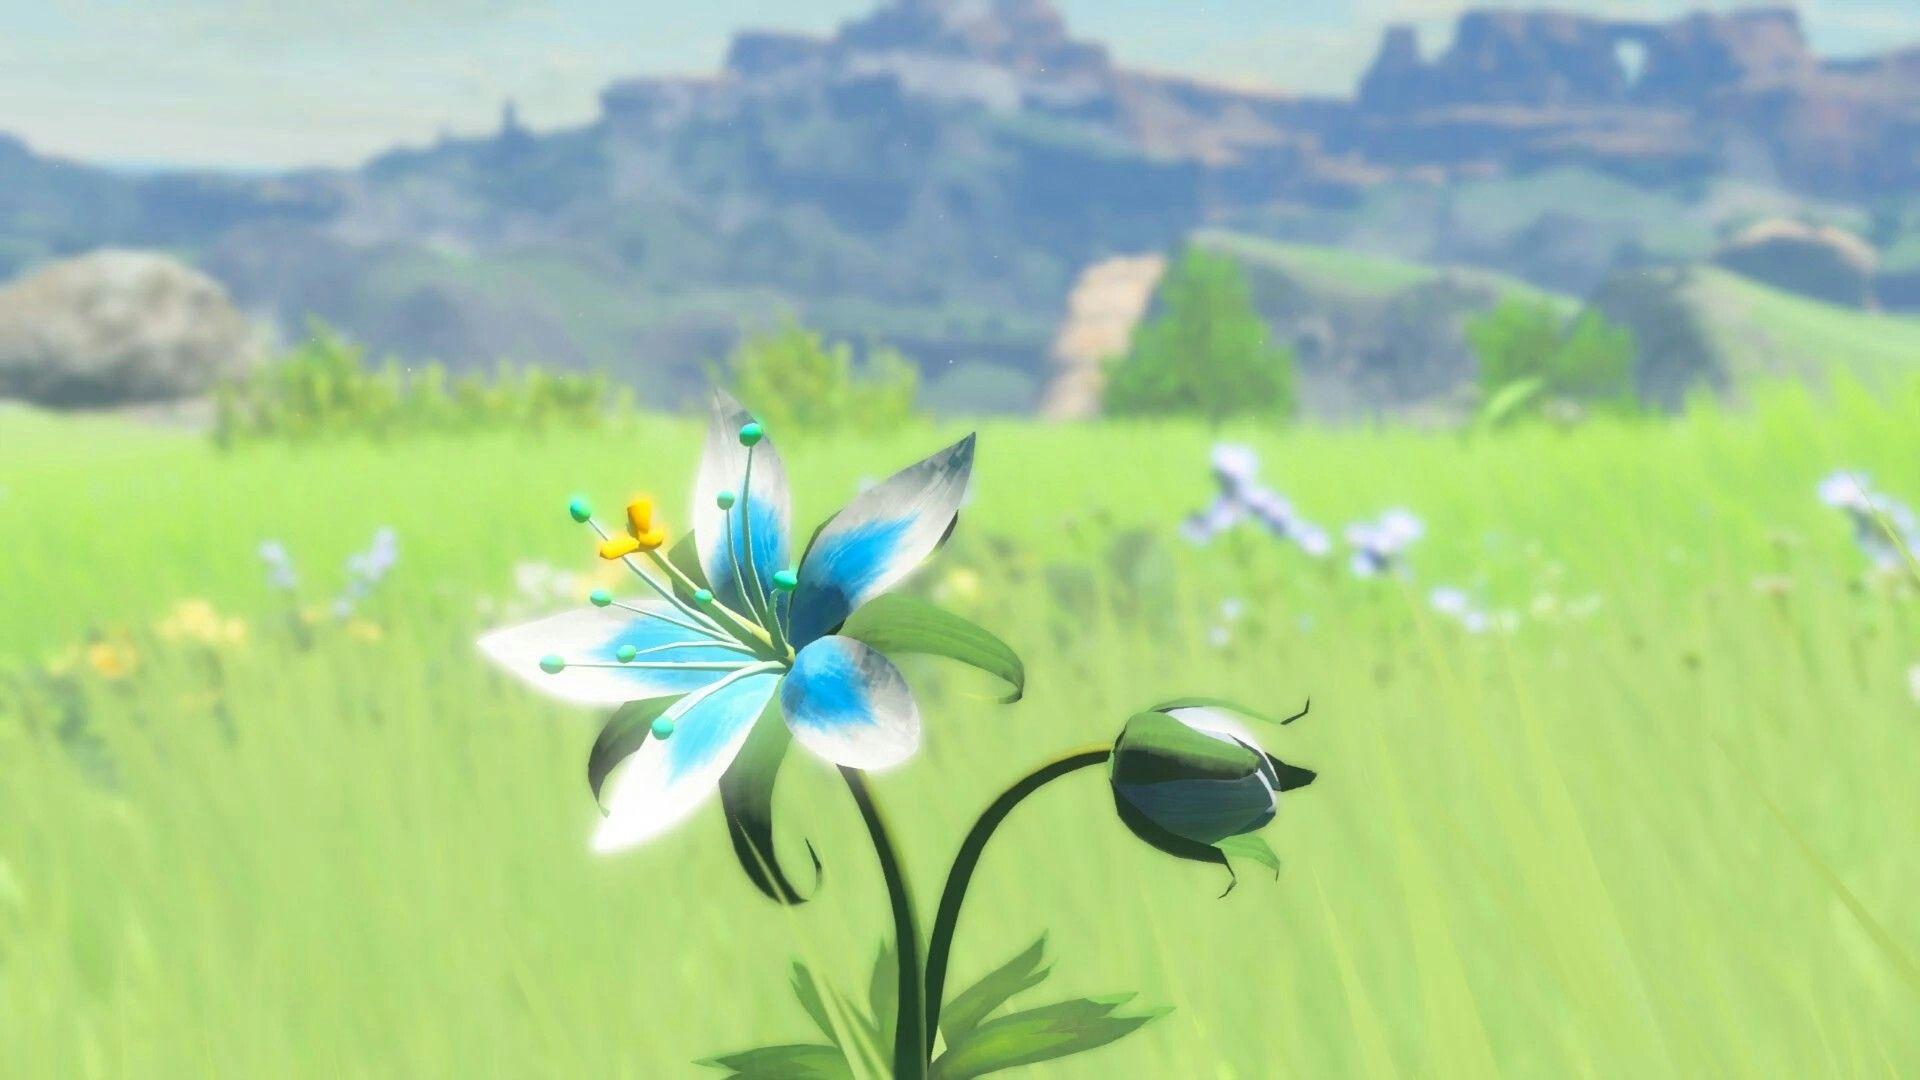 Silent princess flower from BOTW